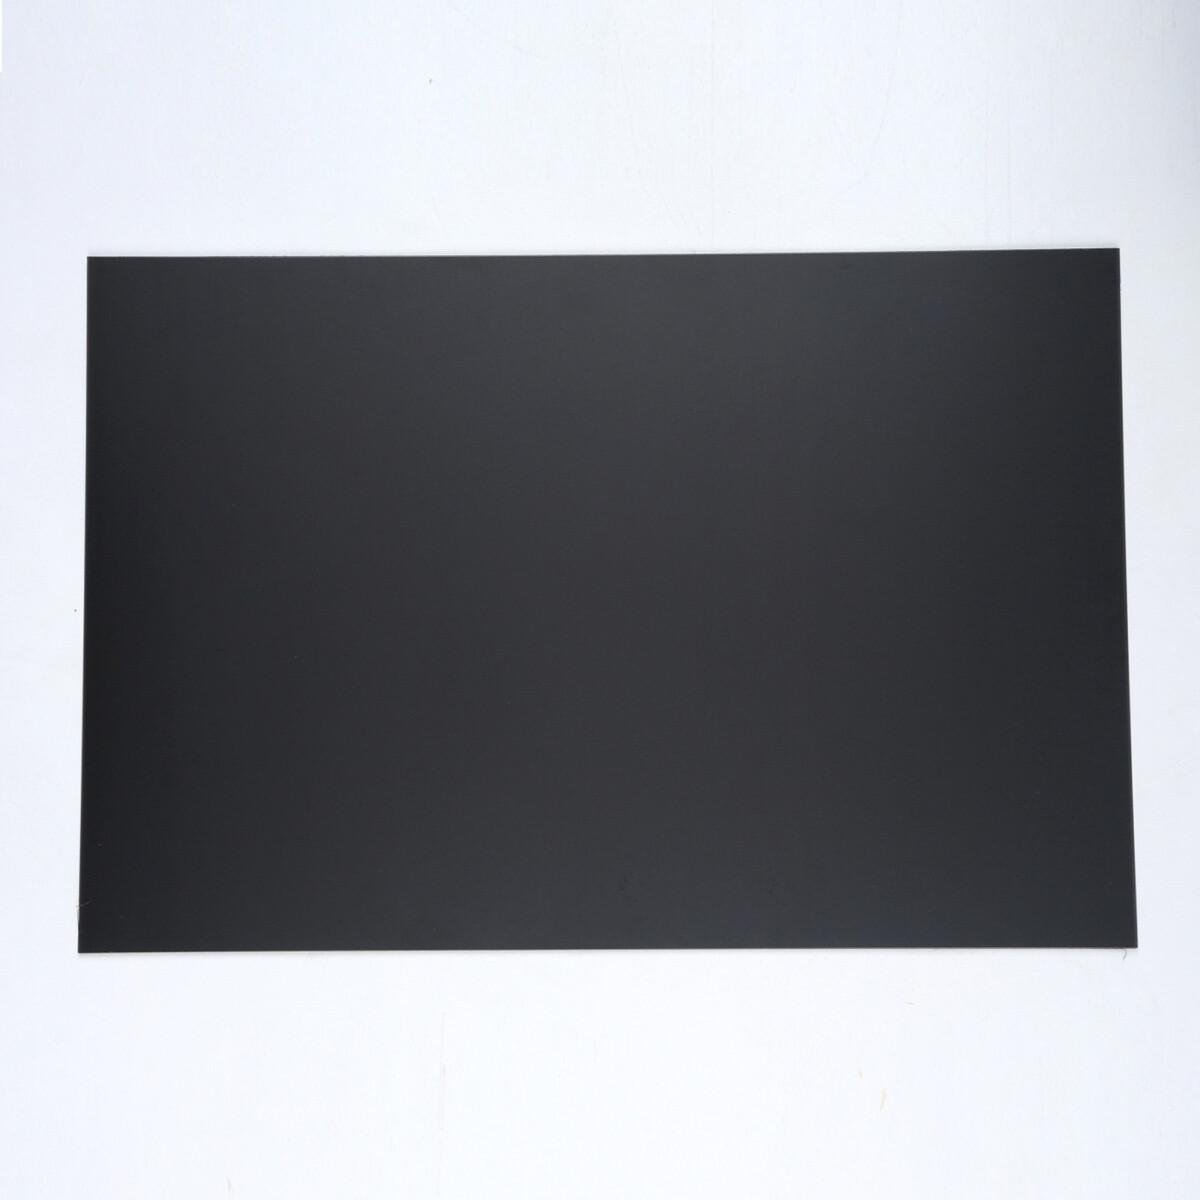 "Brio Pickguard Blanks 12"" x 17"" 1 Ply  Black"